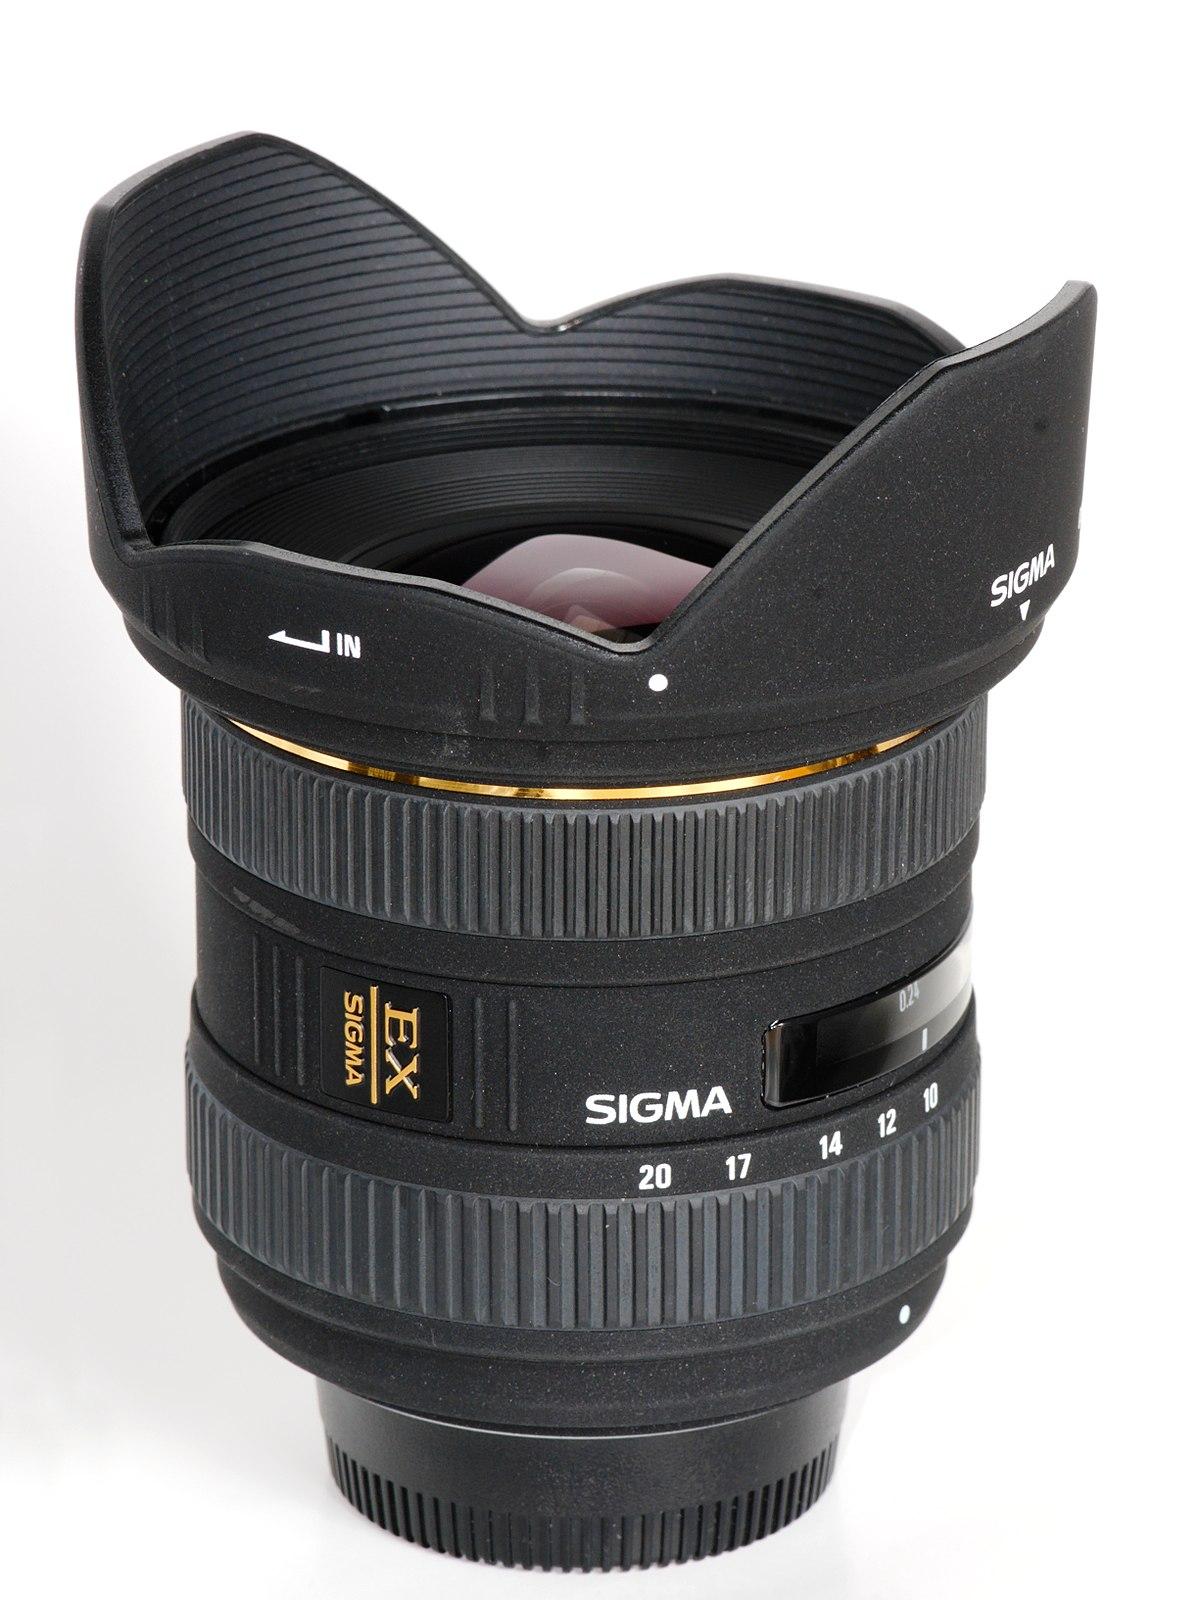 Sigma 10–20mm f/4–5.6 EX DC HSM lens - Wikipedia